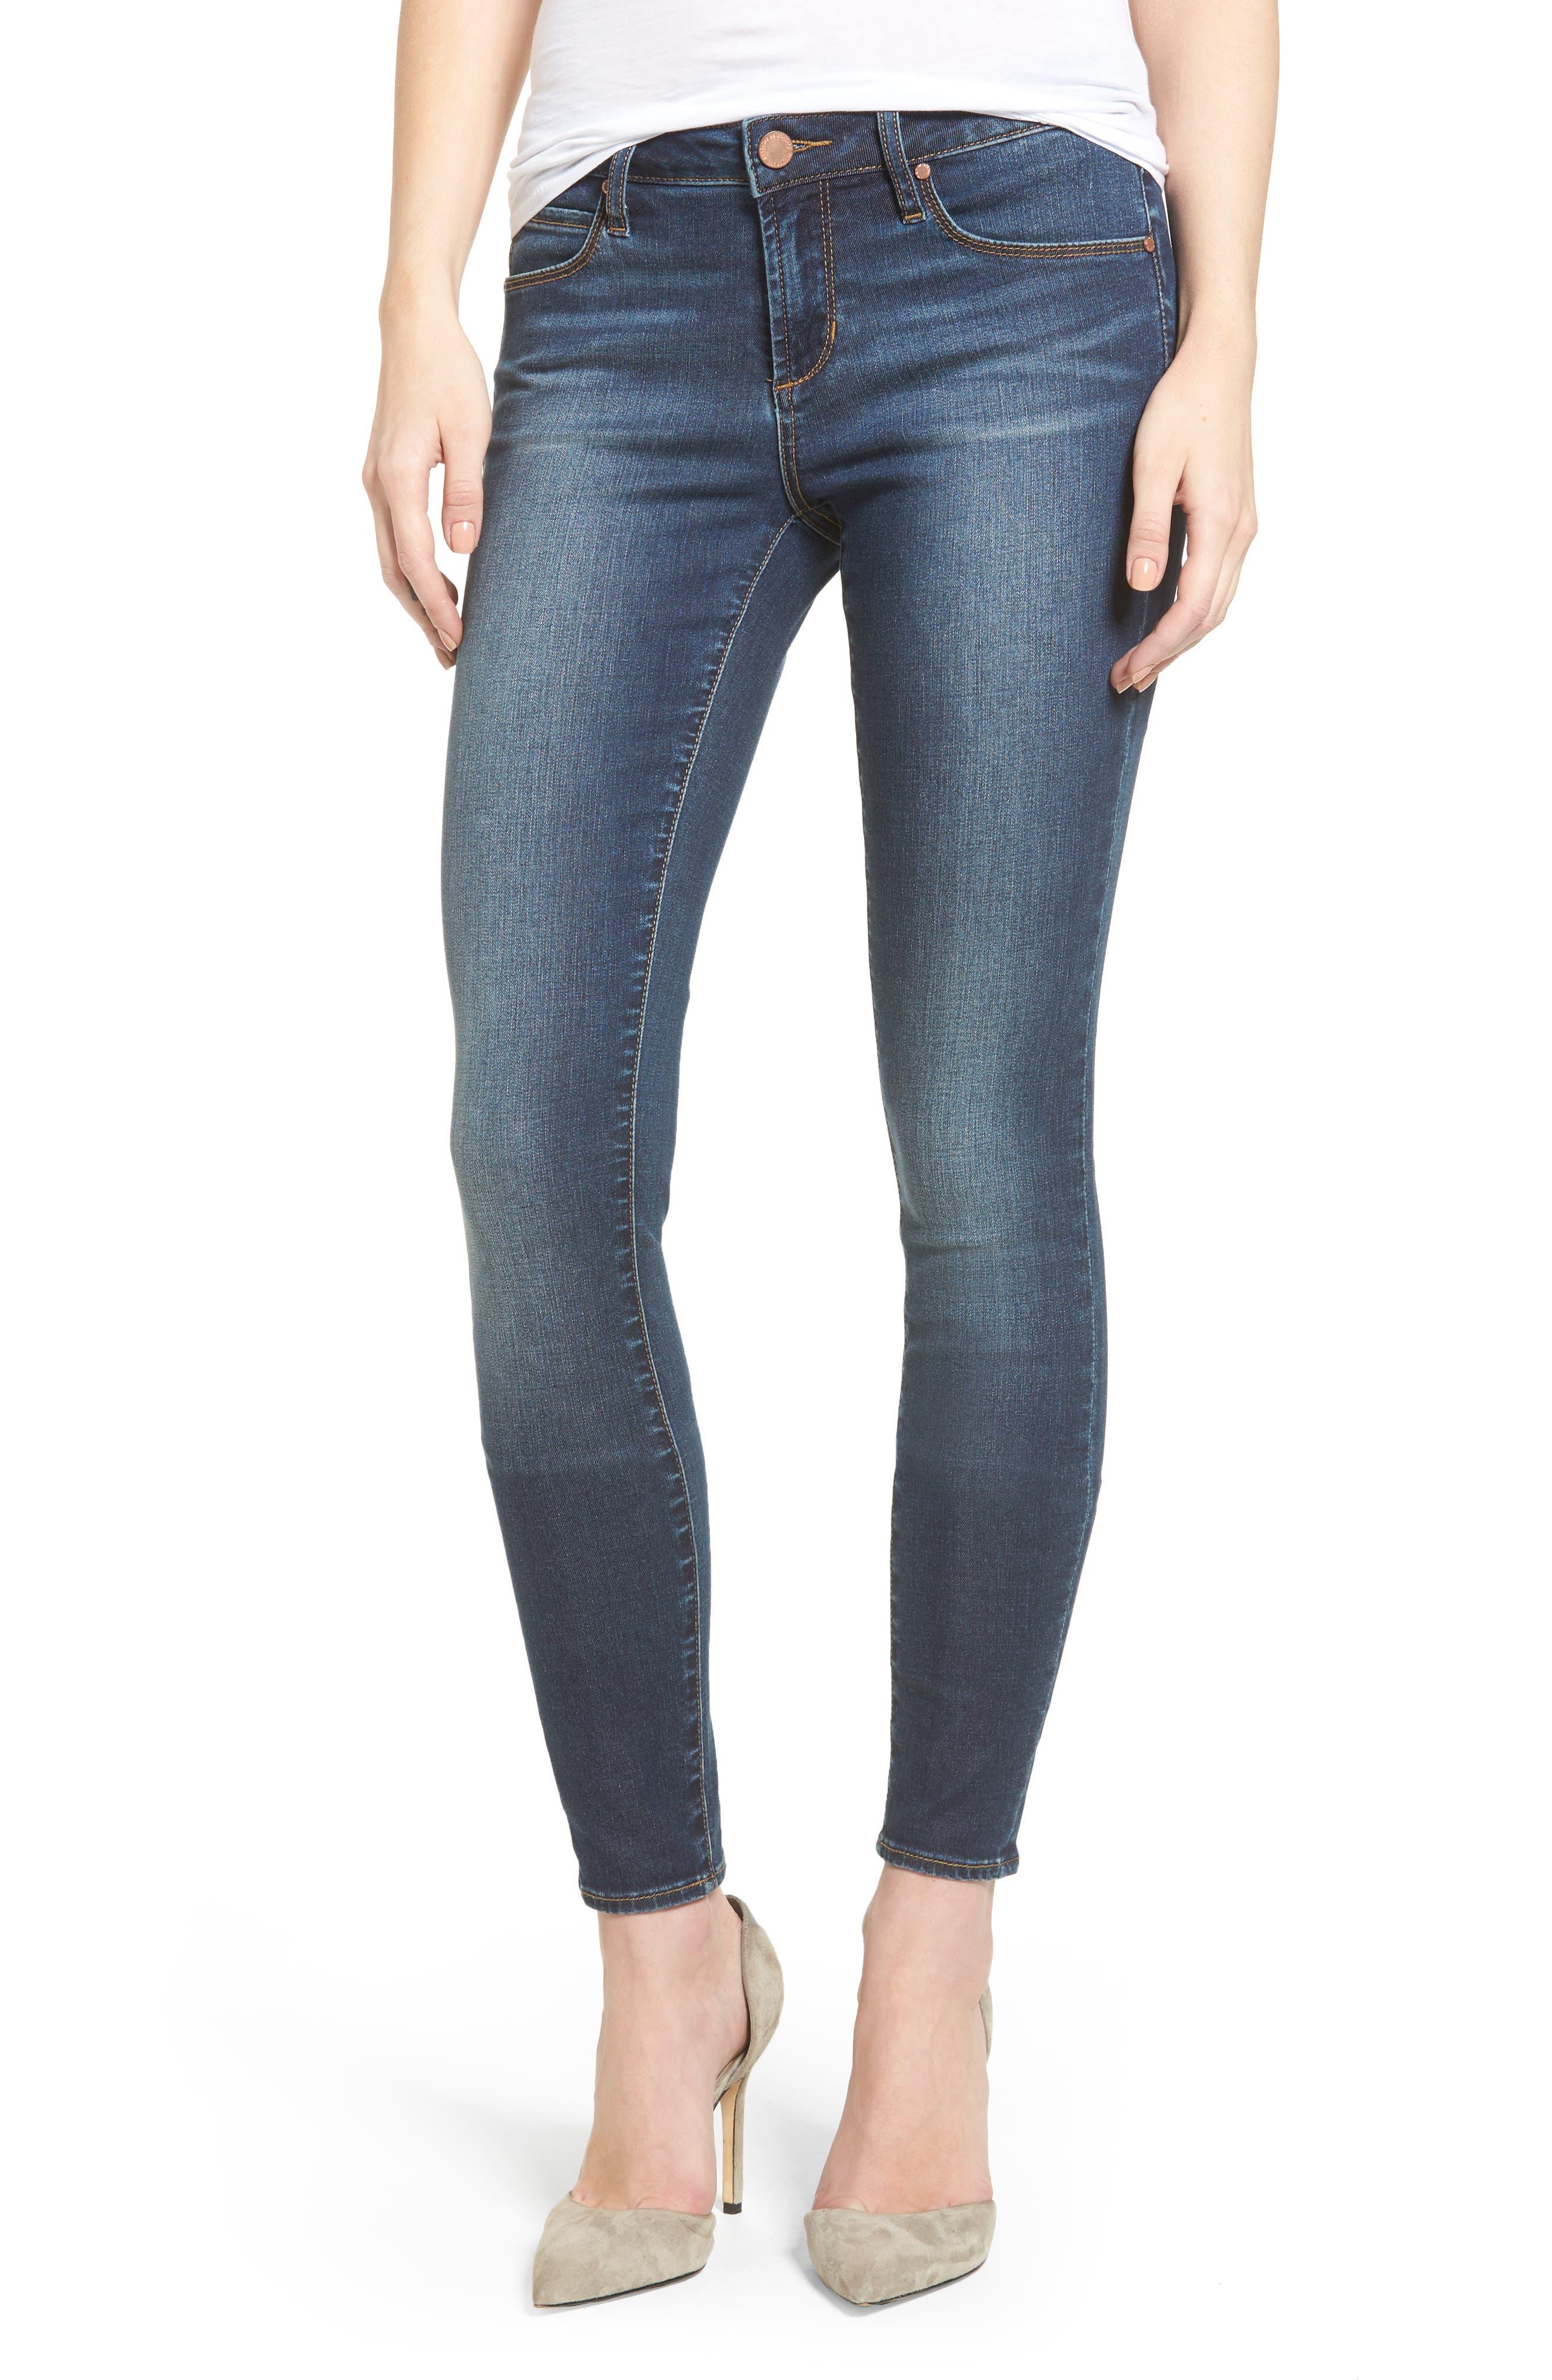 Alternate Image 1 Selected - Articles of Society Mya Skinny Jeans (Glendale)